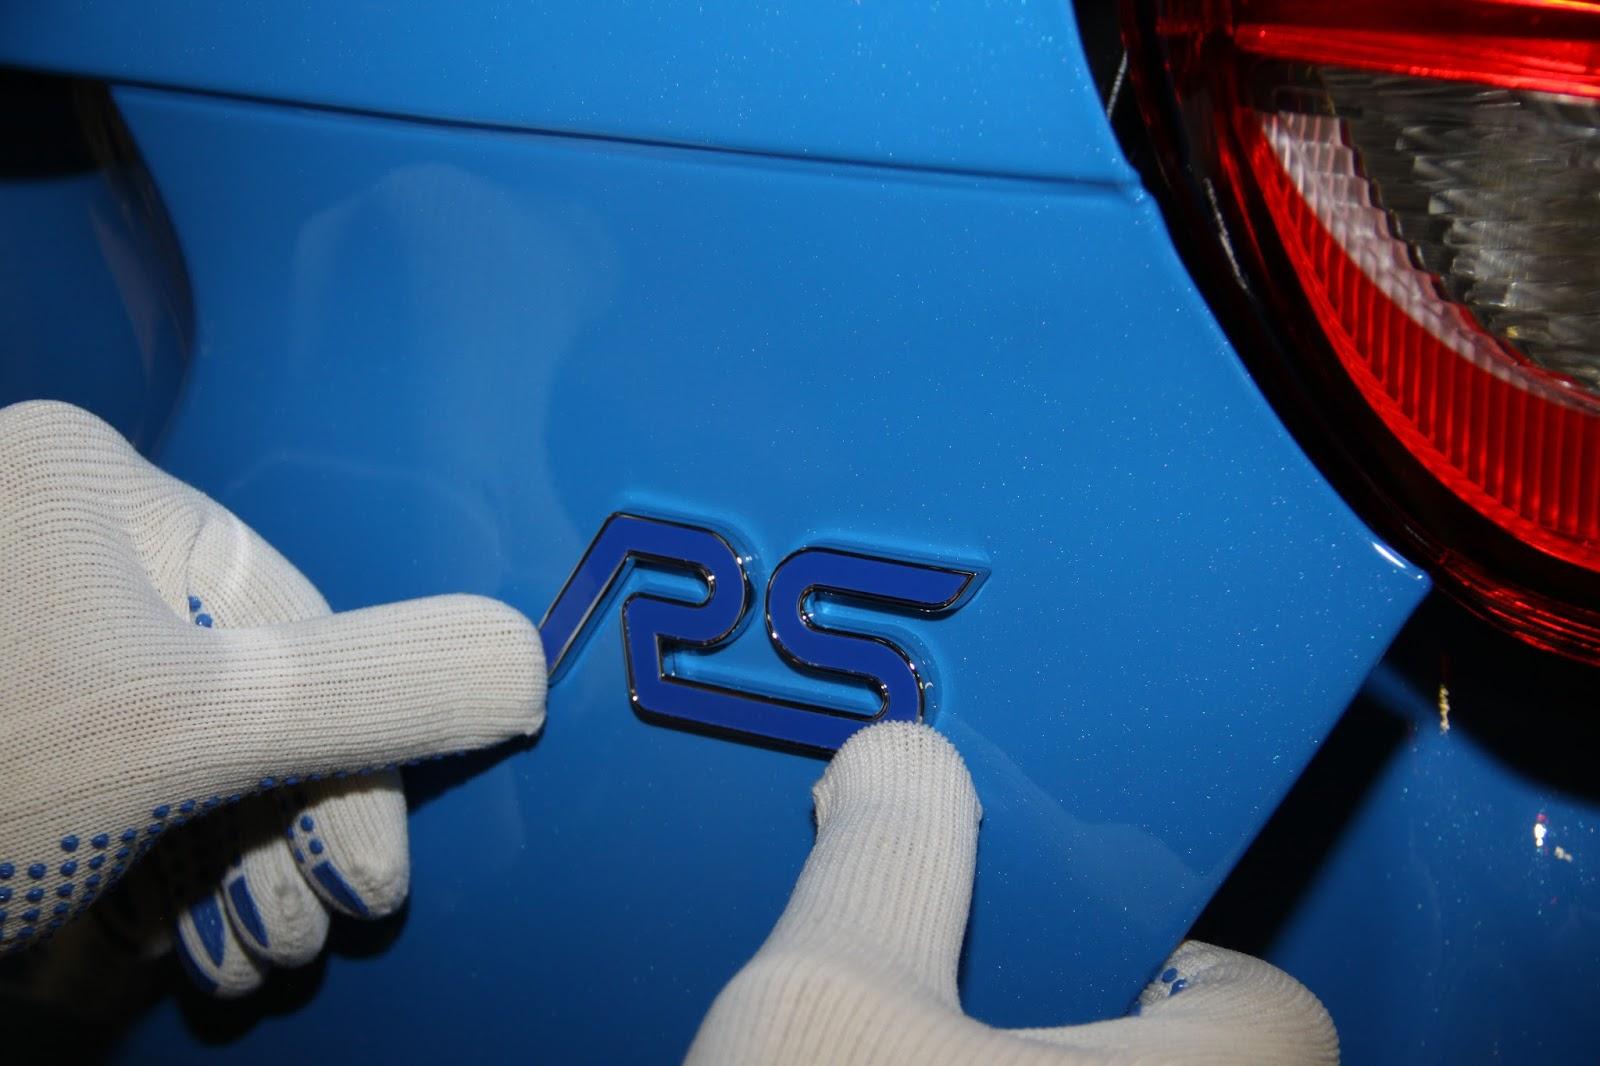 FocusRS Production 04 Το πρώτο Focus RS βγήκε από τη γραμμή παραγωγής του Saarlouis στη Γερμανία, έρχεται και το Ford GT